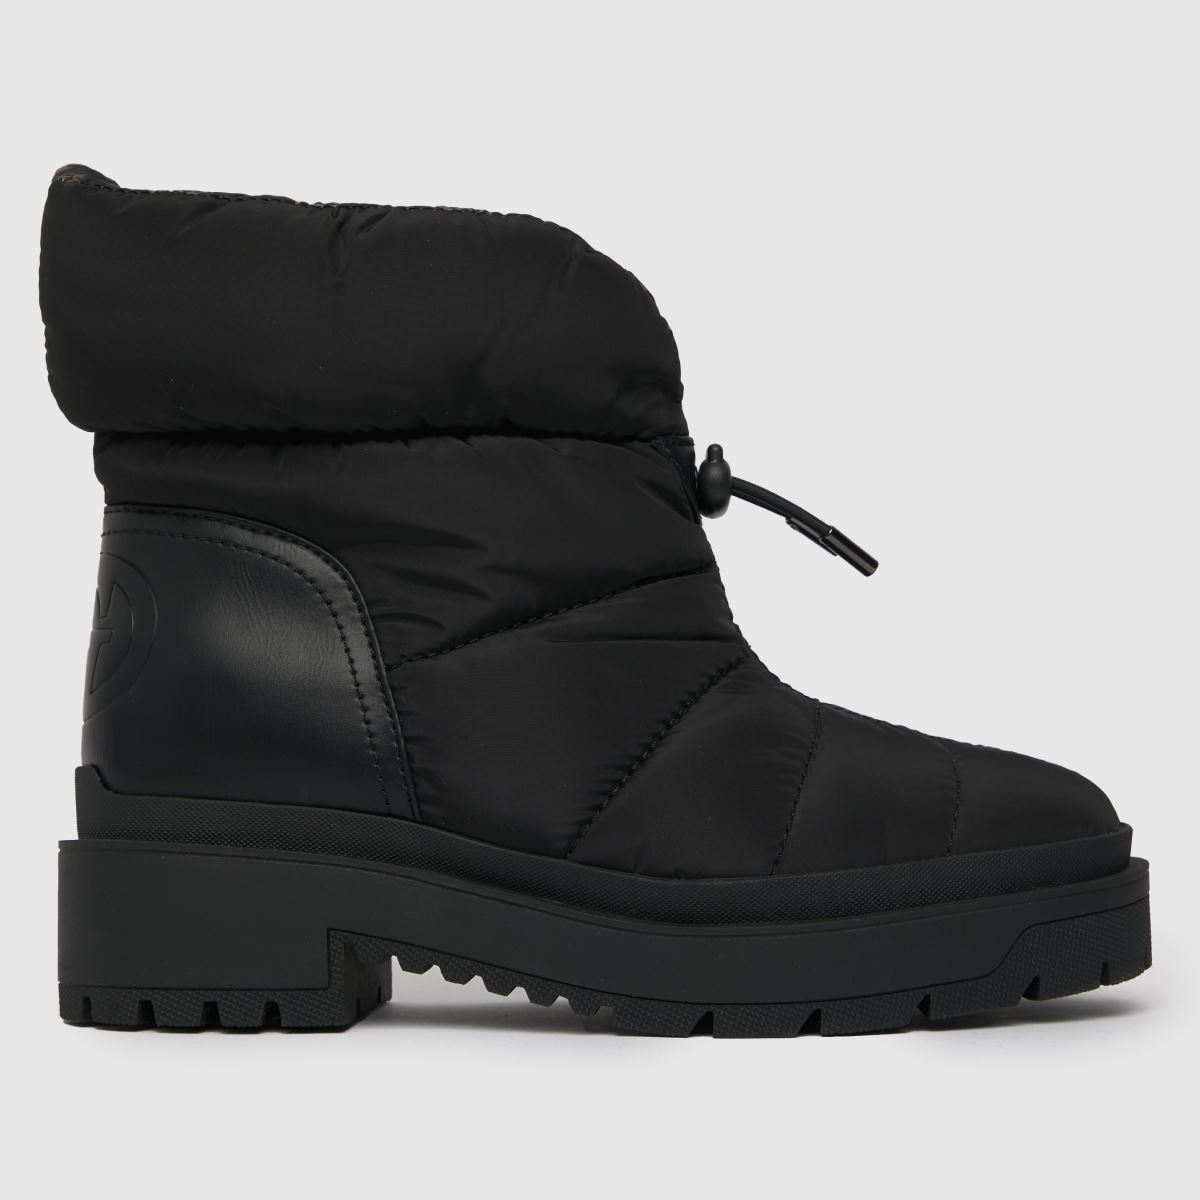 GUESS Black Leeda Boot Boots